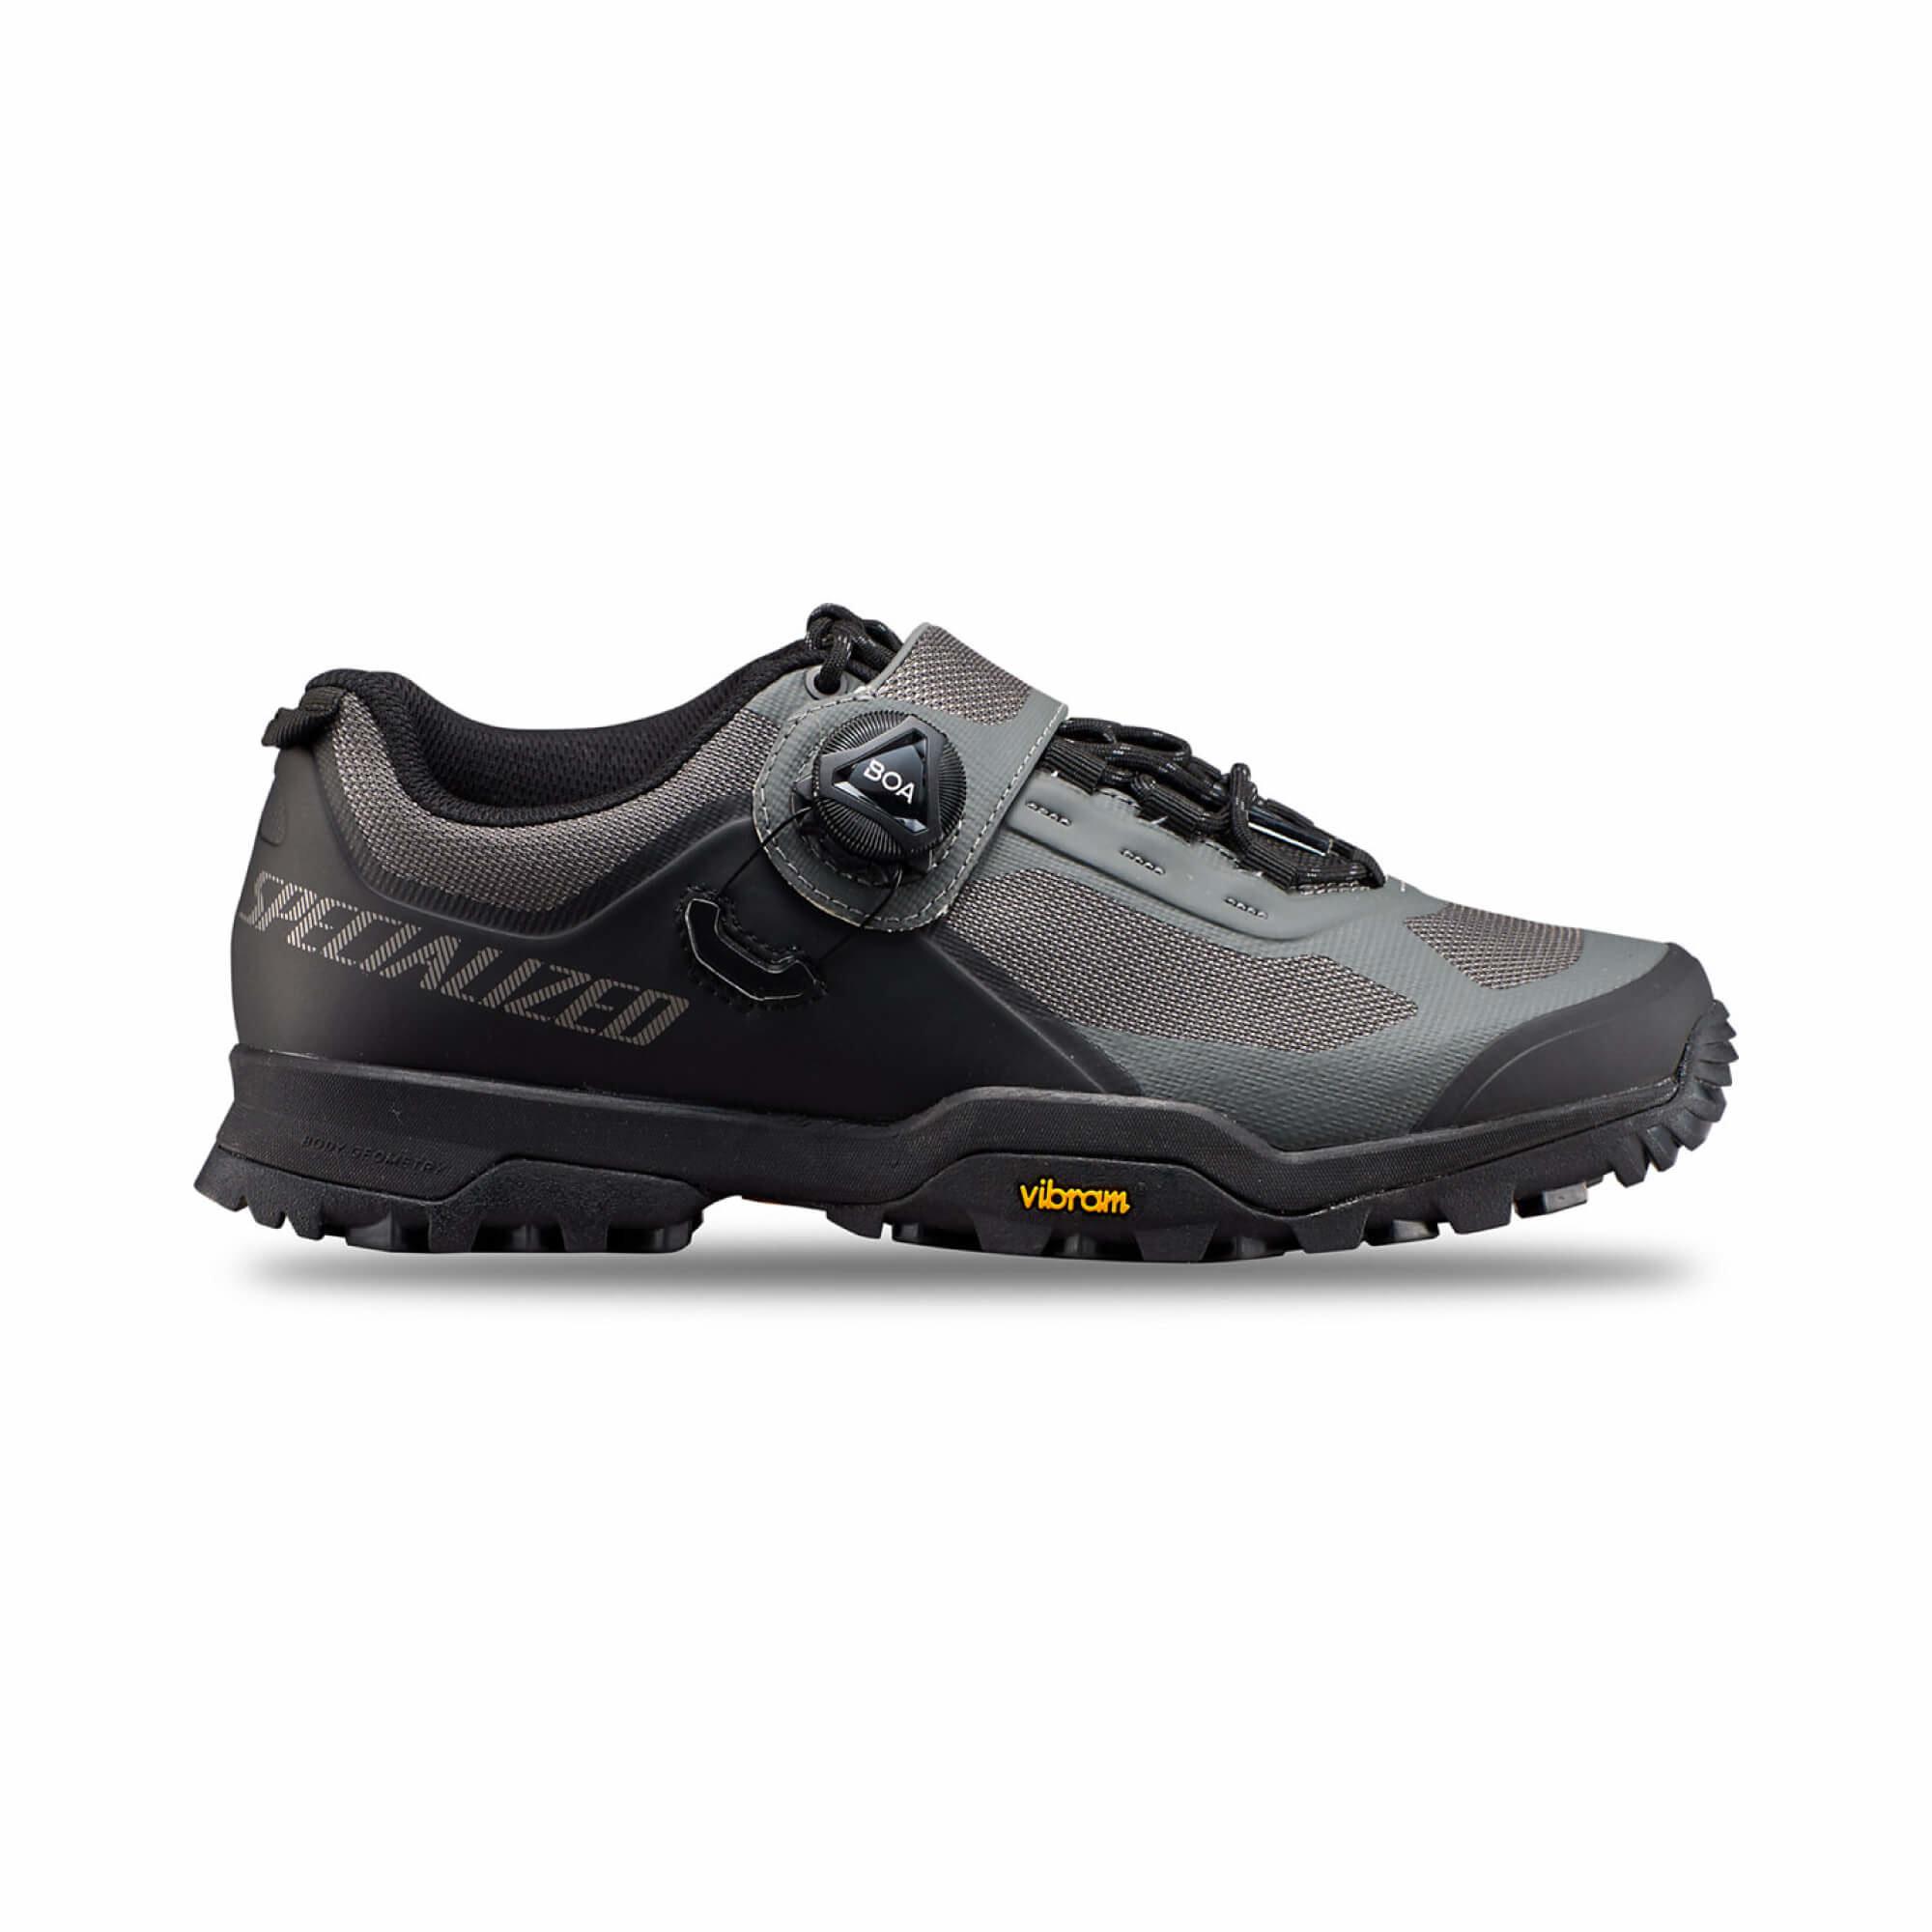 Rime 2.0 Mountain Bike Shoes-10